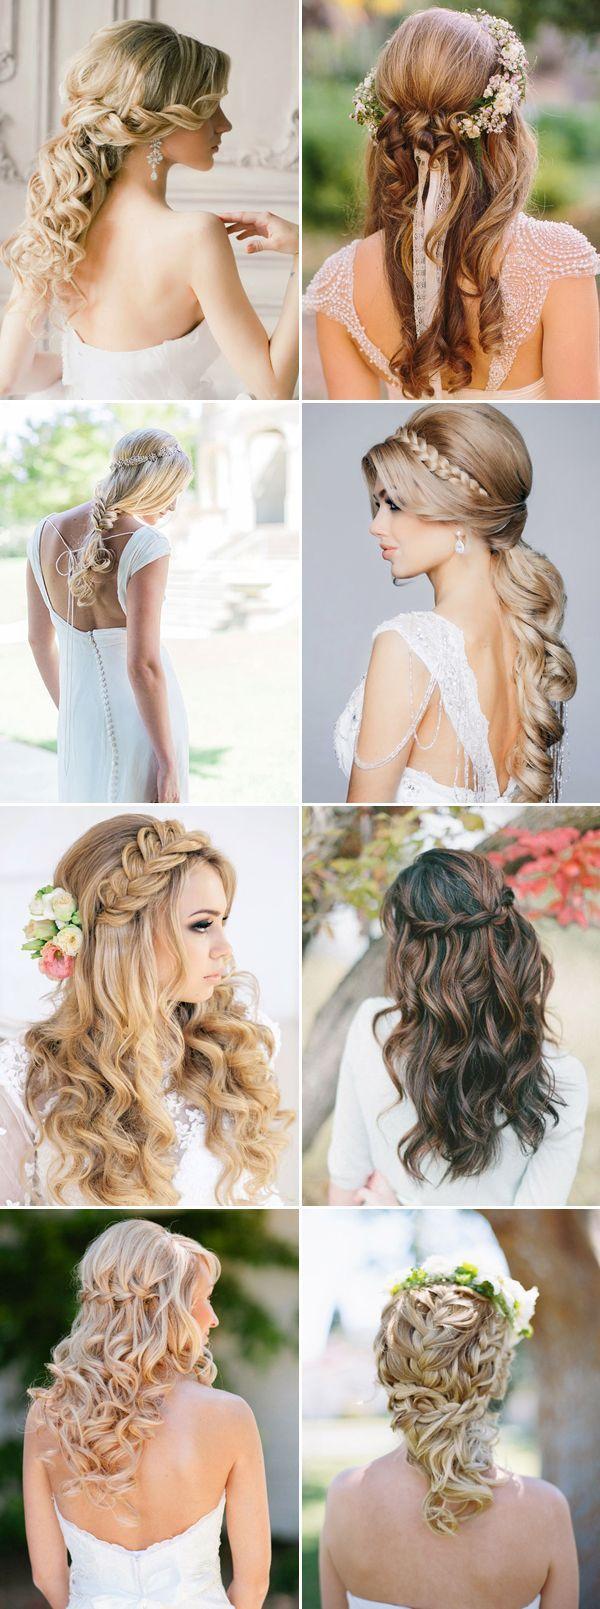 gorgeous half up half down hairstyles for brides bridal braids